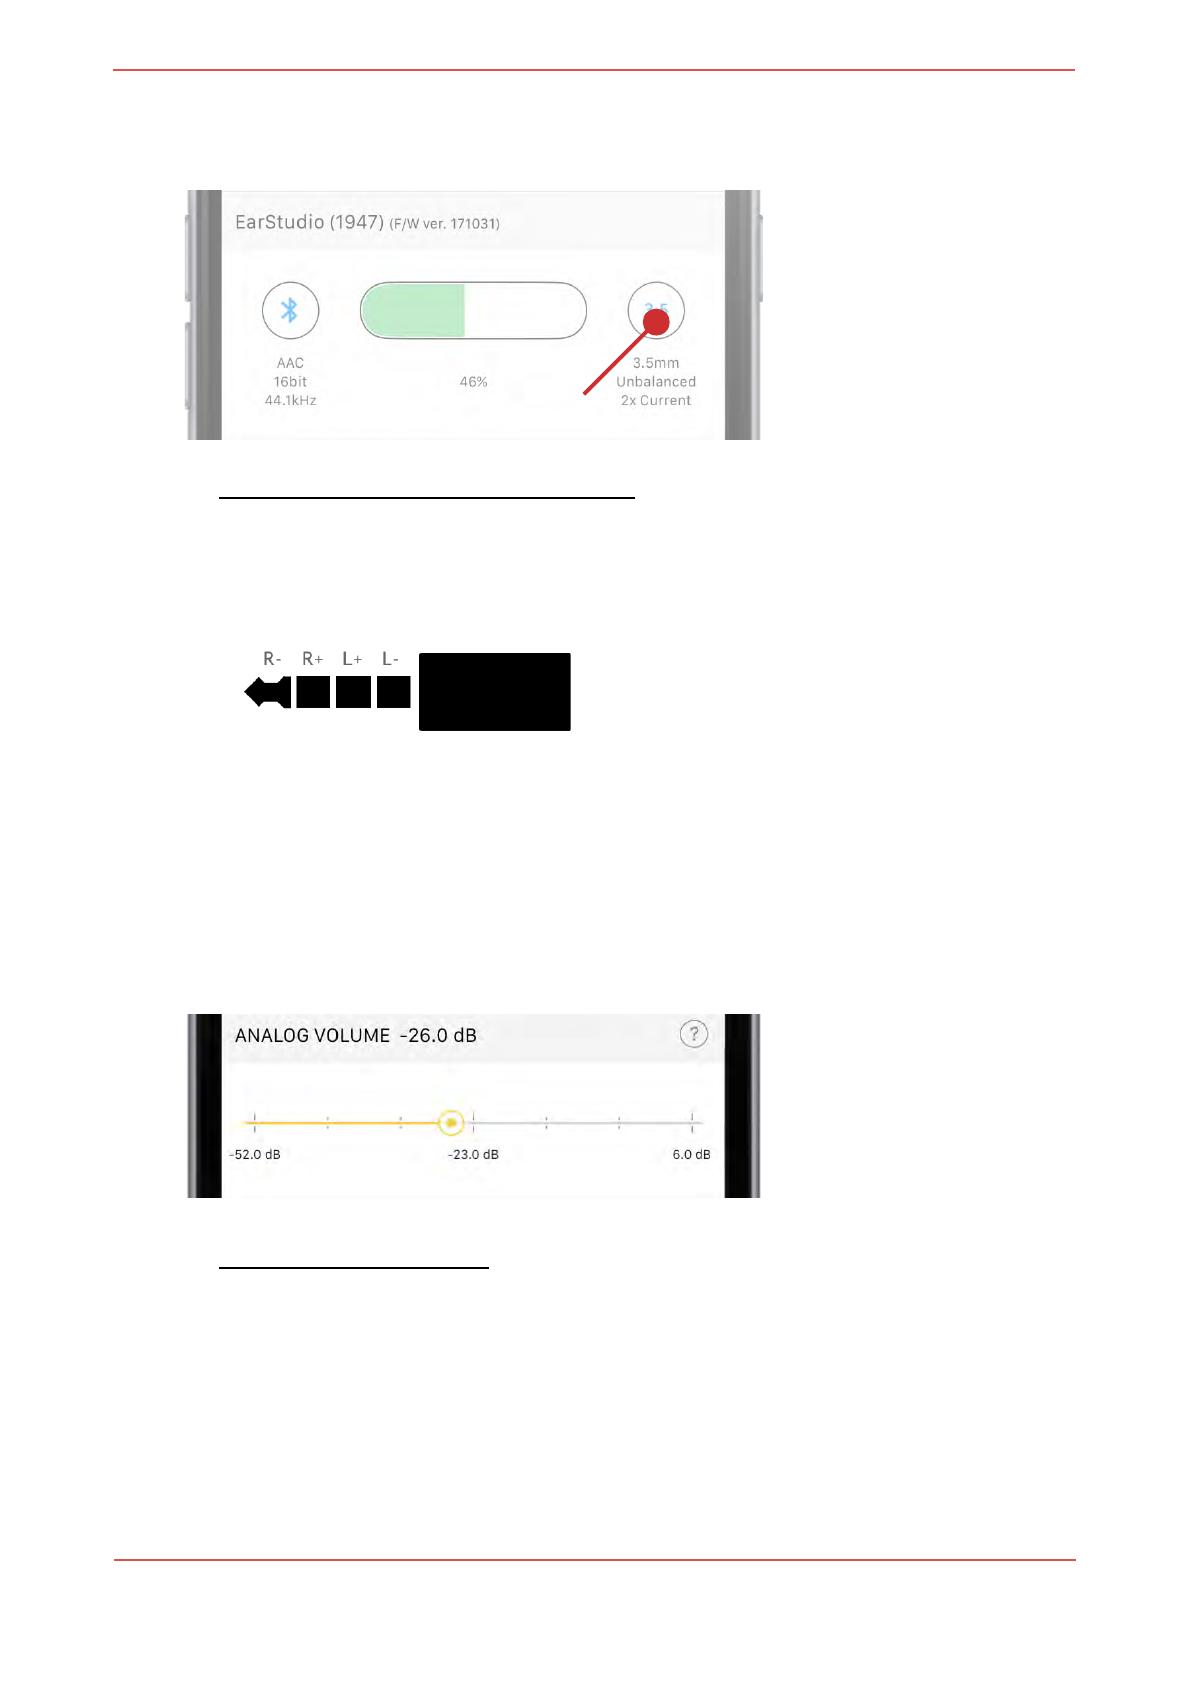 Radsone ES100 Bluetooth Receiver User Manual EarStudio